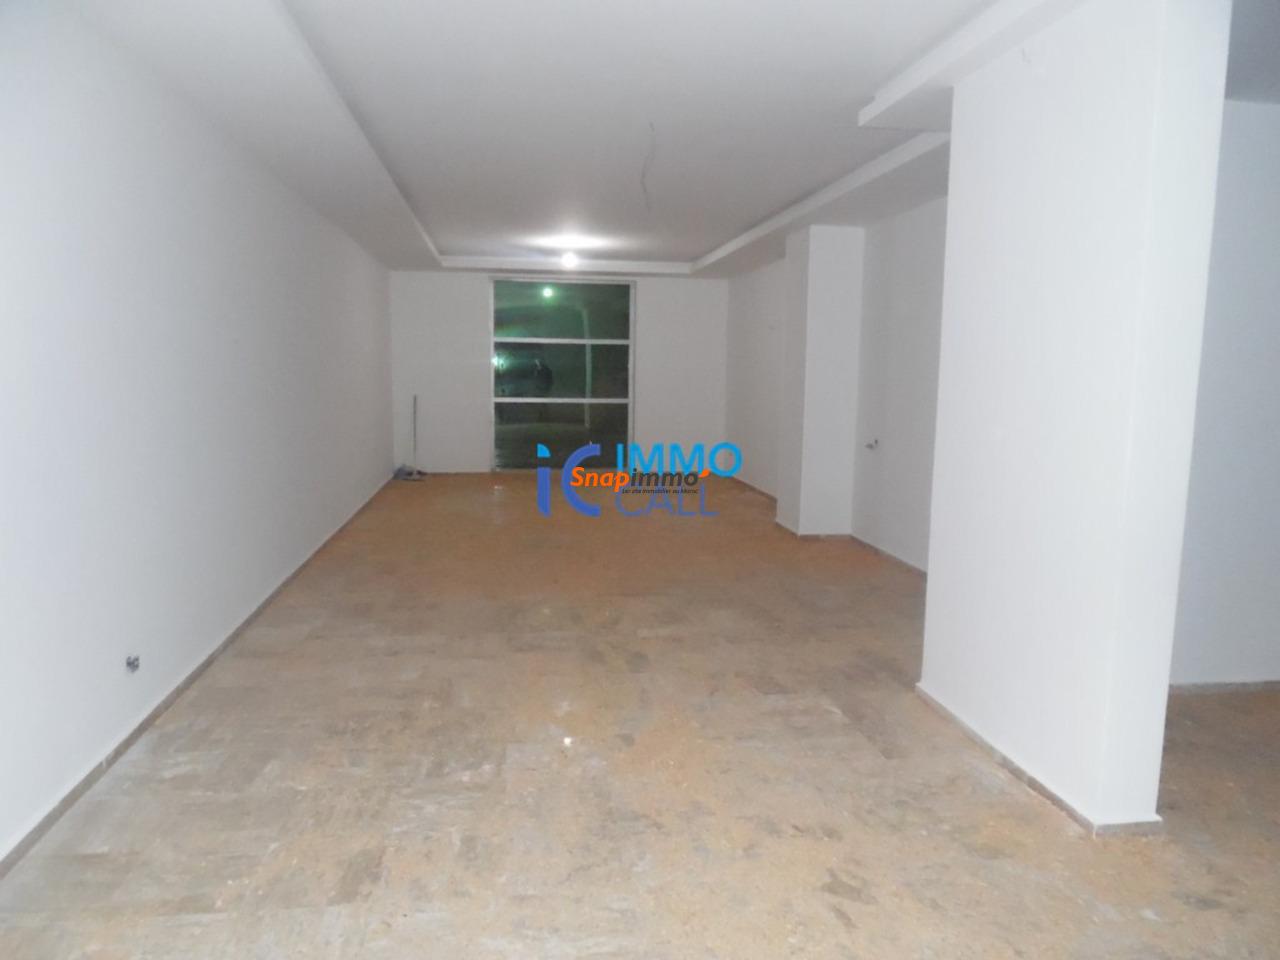 Magasin de 128 m² en location à Hay raid - 3/4